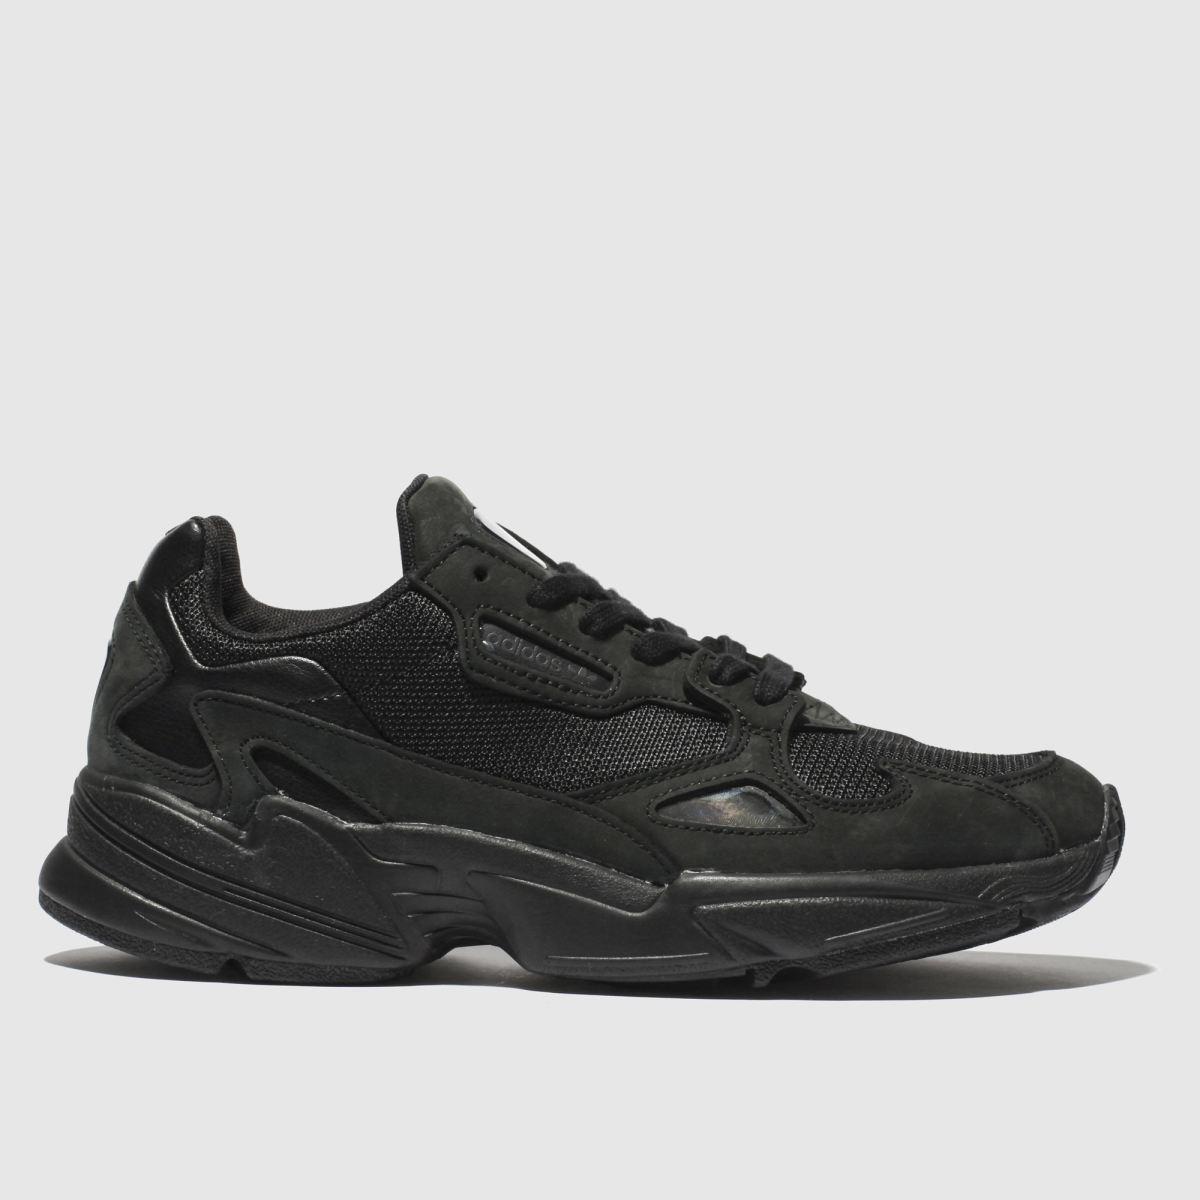 Adidas Black Falcon Trainers